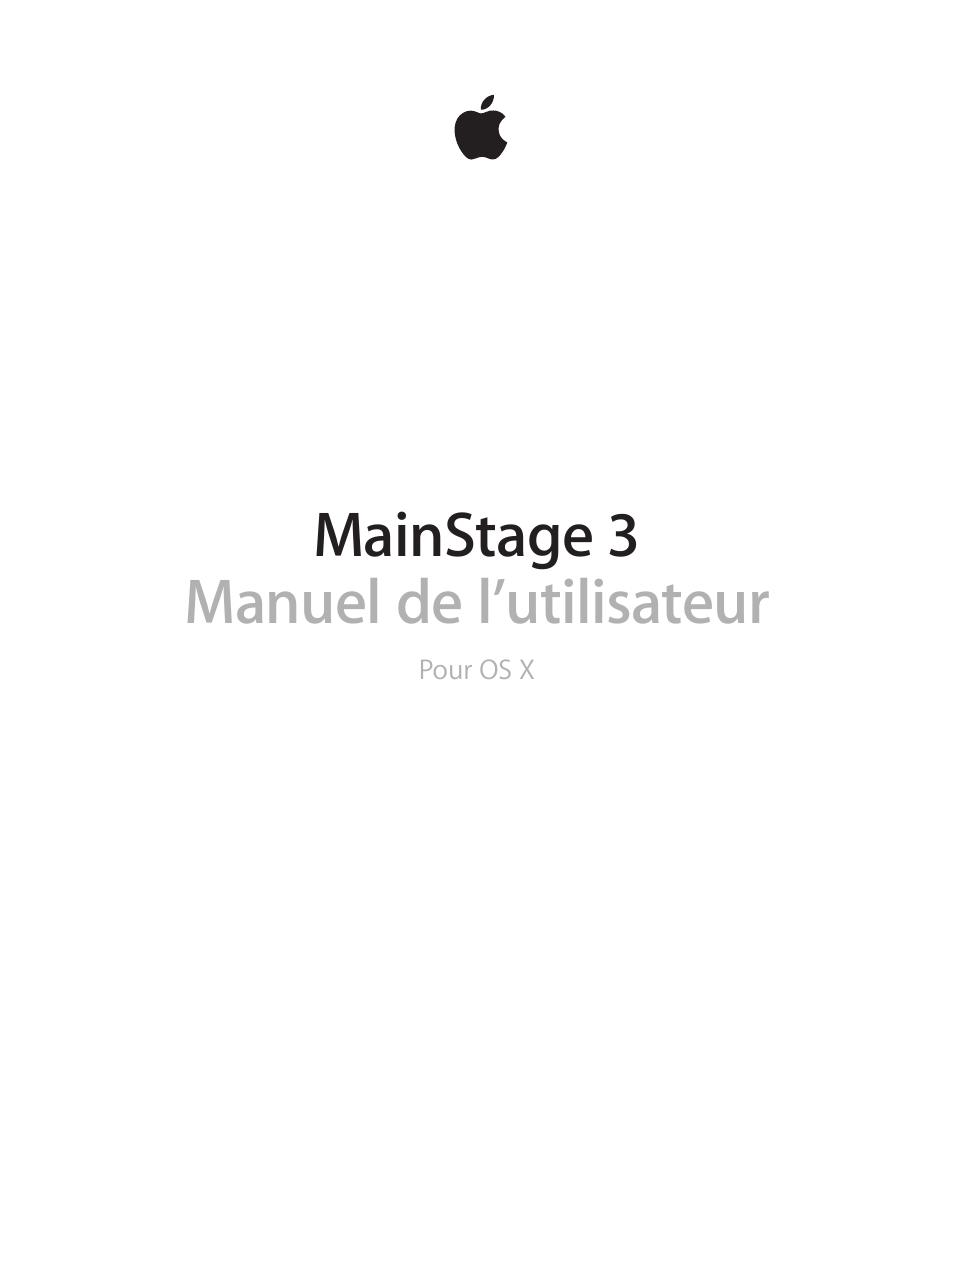 Apple One Manual Auto Electrical Wiring Diagram Clock Time Intermatic T103tc Mainstage 3 Manuel D U0026 39 Utilisation